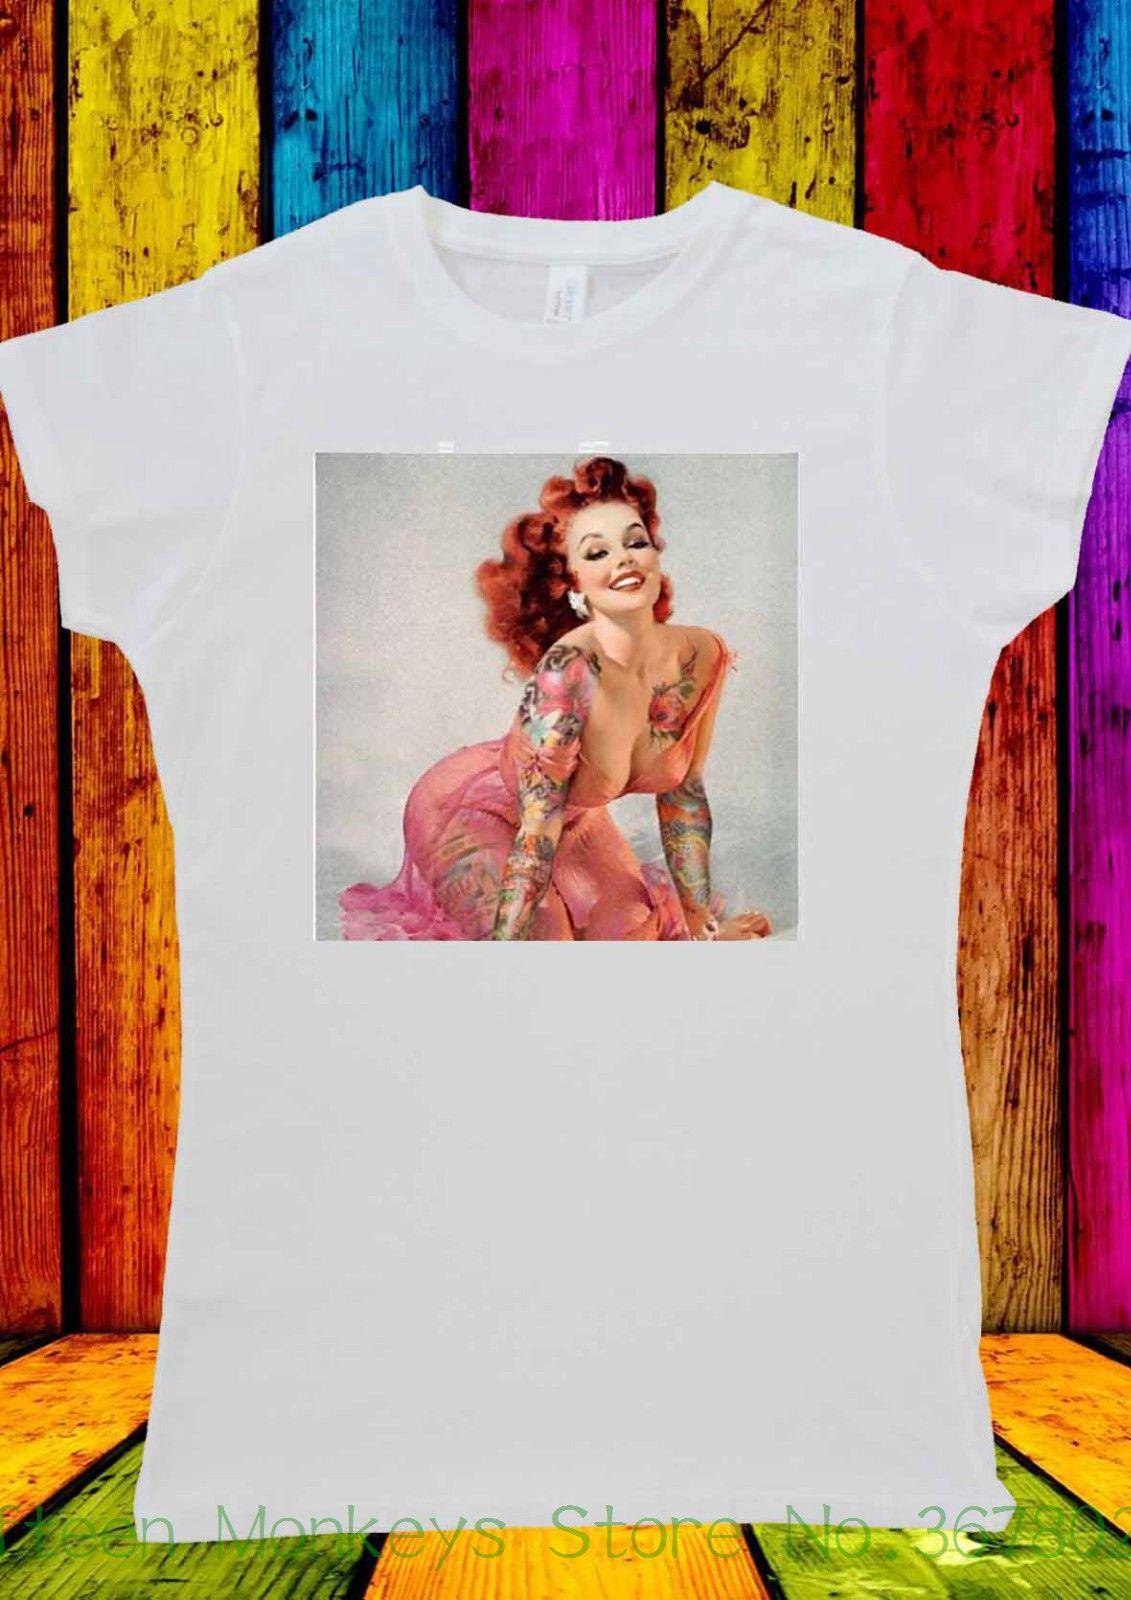 d15cbd102a2 Women's Tee Pin Up Girl Sexy Tattoo Bettie Retro T-shirt Men Women Unisex  2142 2018 Summer Funny Casual